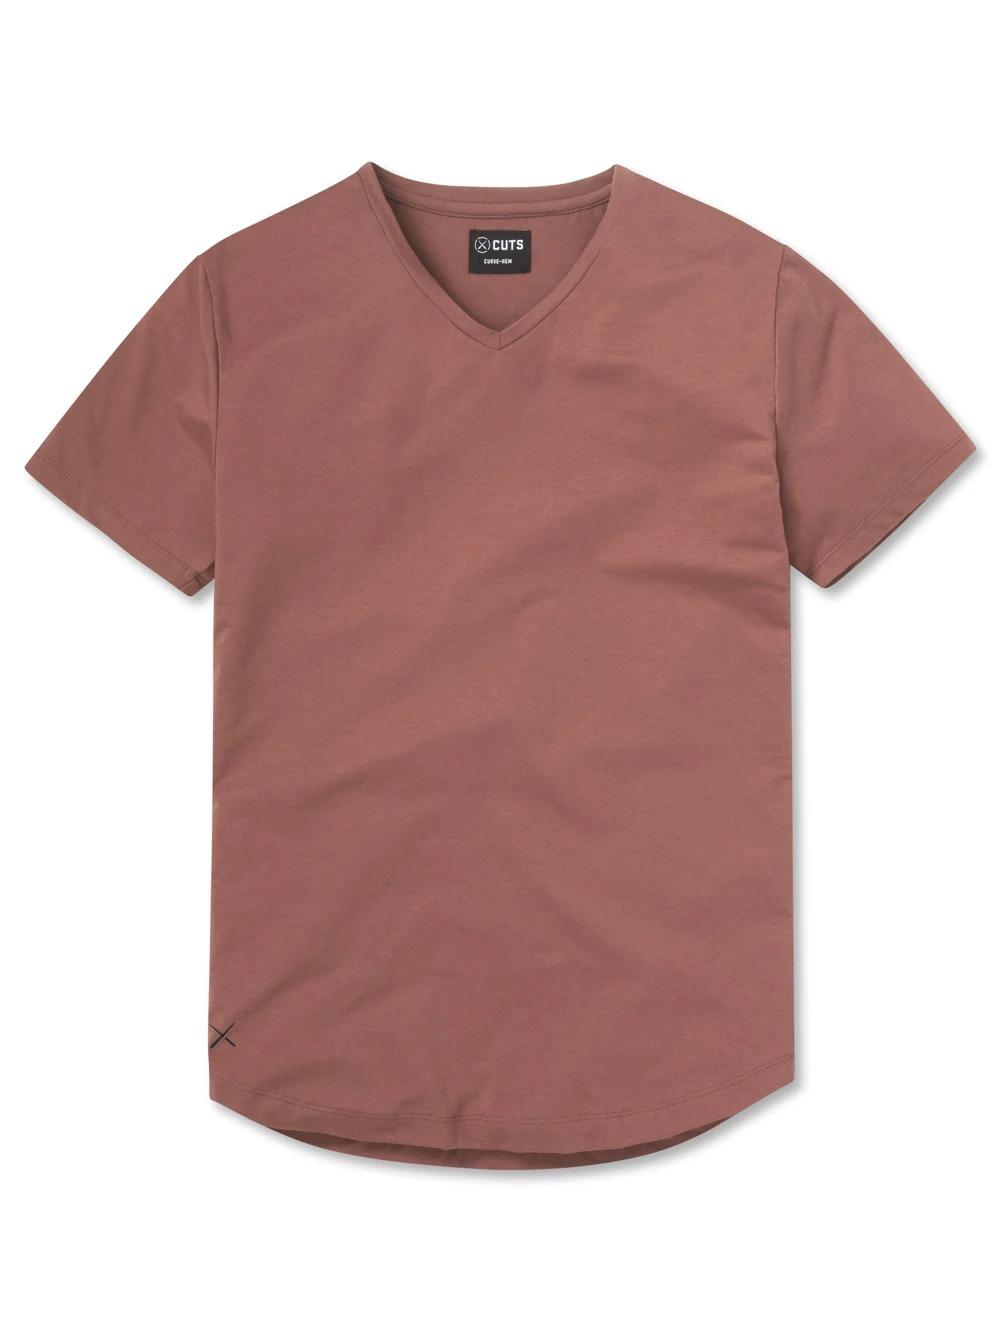 Cuts Clothing V-Neck Curve-Hem